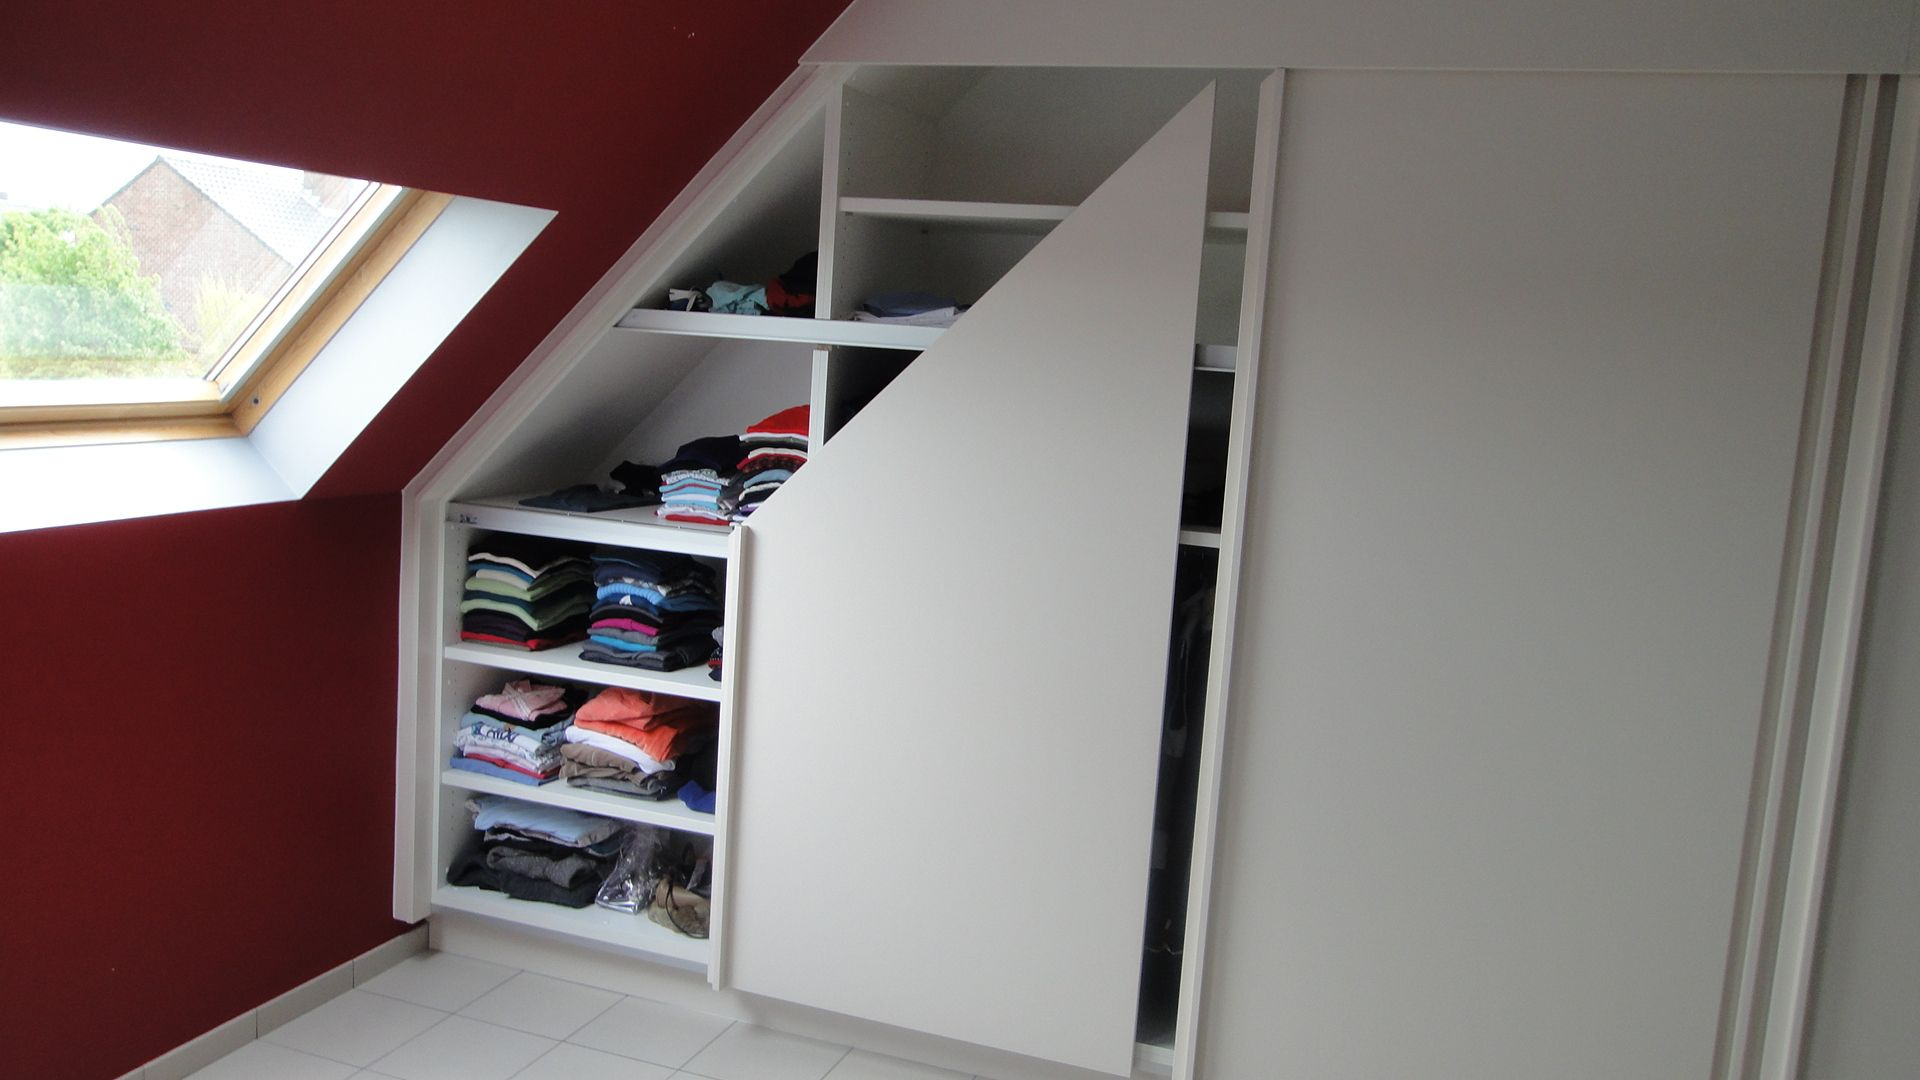 slaapkamers wyma inbouwkasten slaapkamers. Black Bedroom Furniture Sets. Home Design Ideas